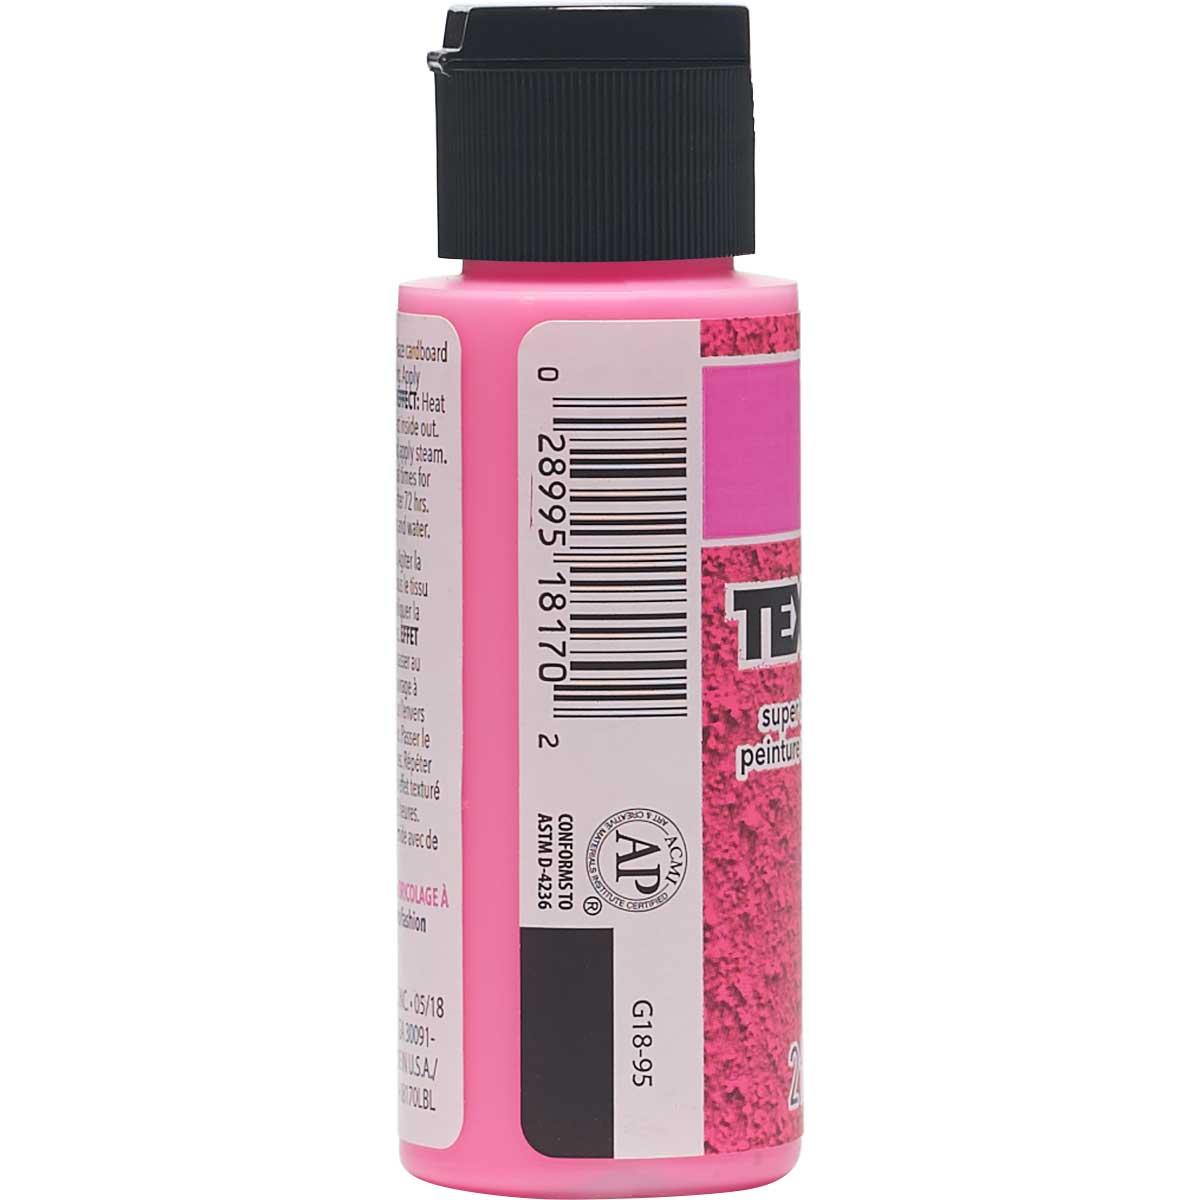 LaurDIY ® Texturific™ Fabric Paint - G2G, 2 oz.